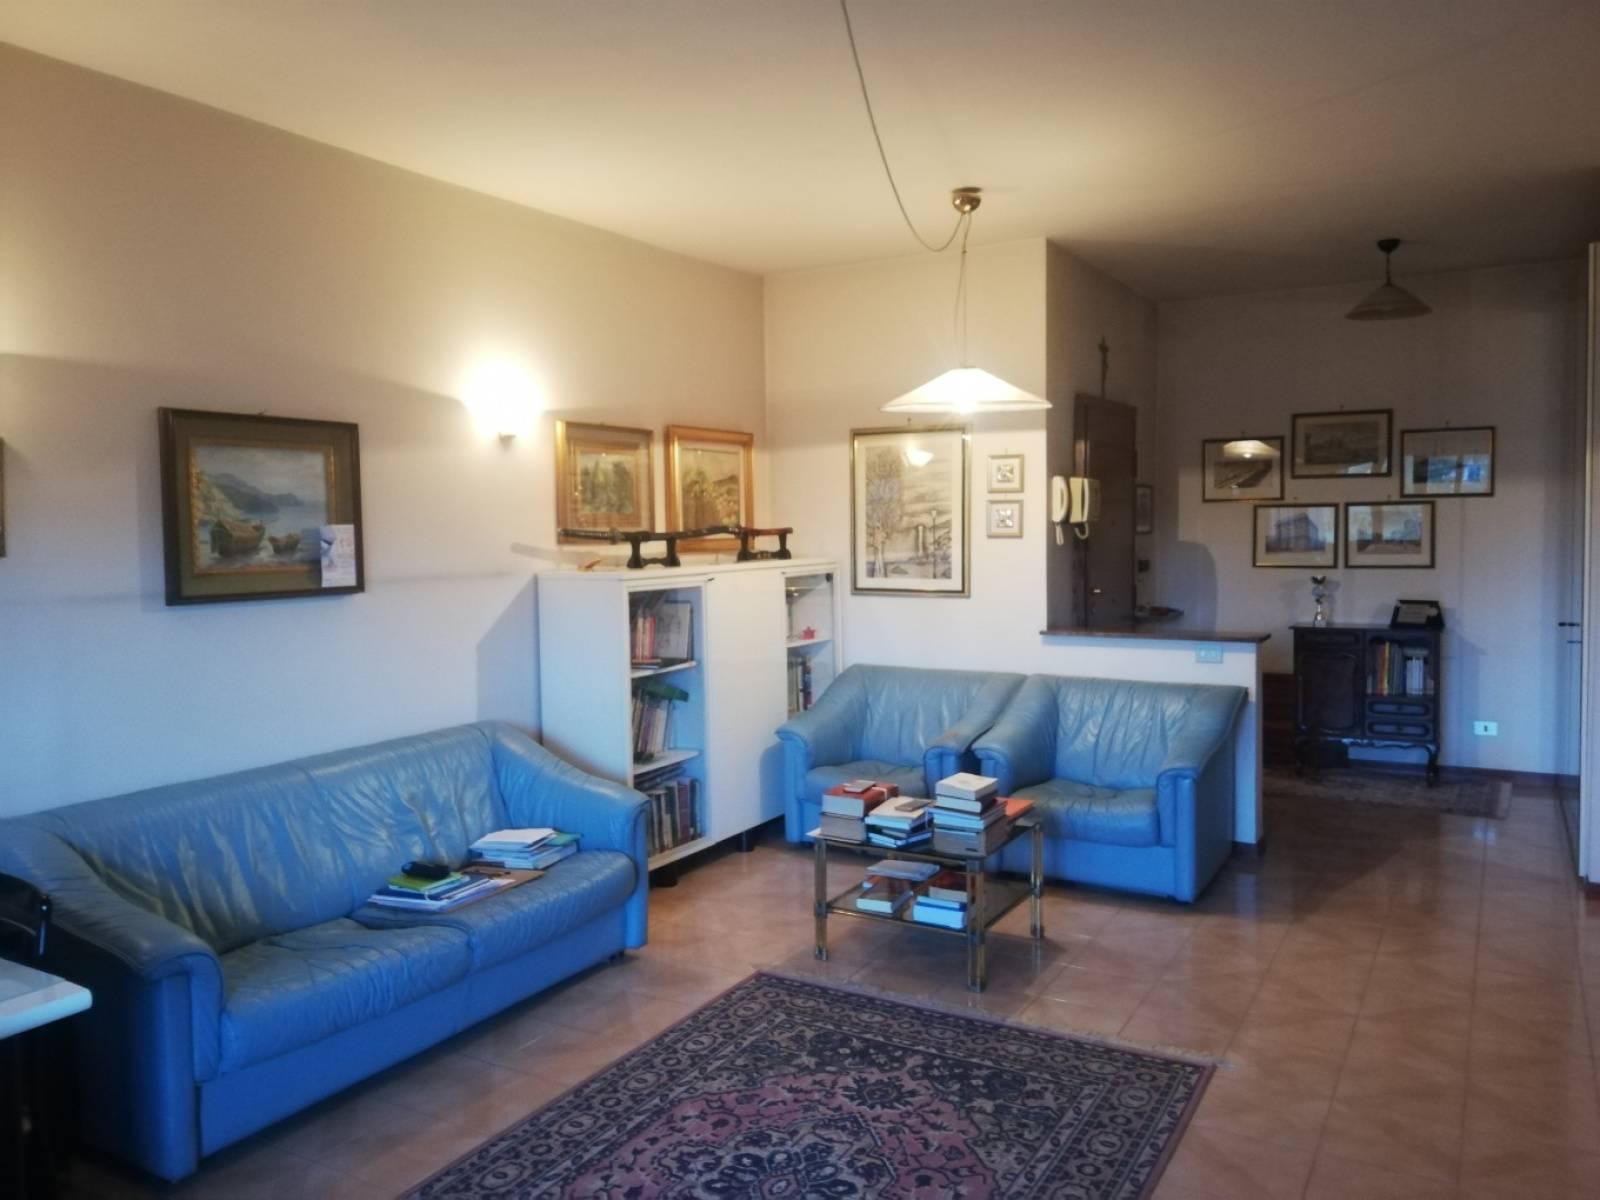 1118418816 Quadrilocale in Viale Camillo Sabatini, Roma, Zona Torrino